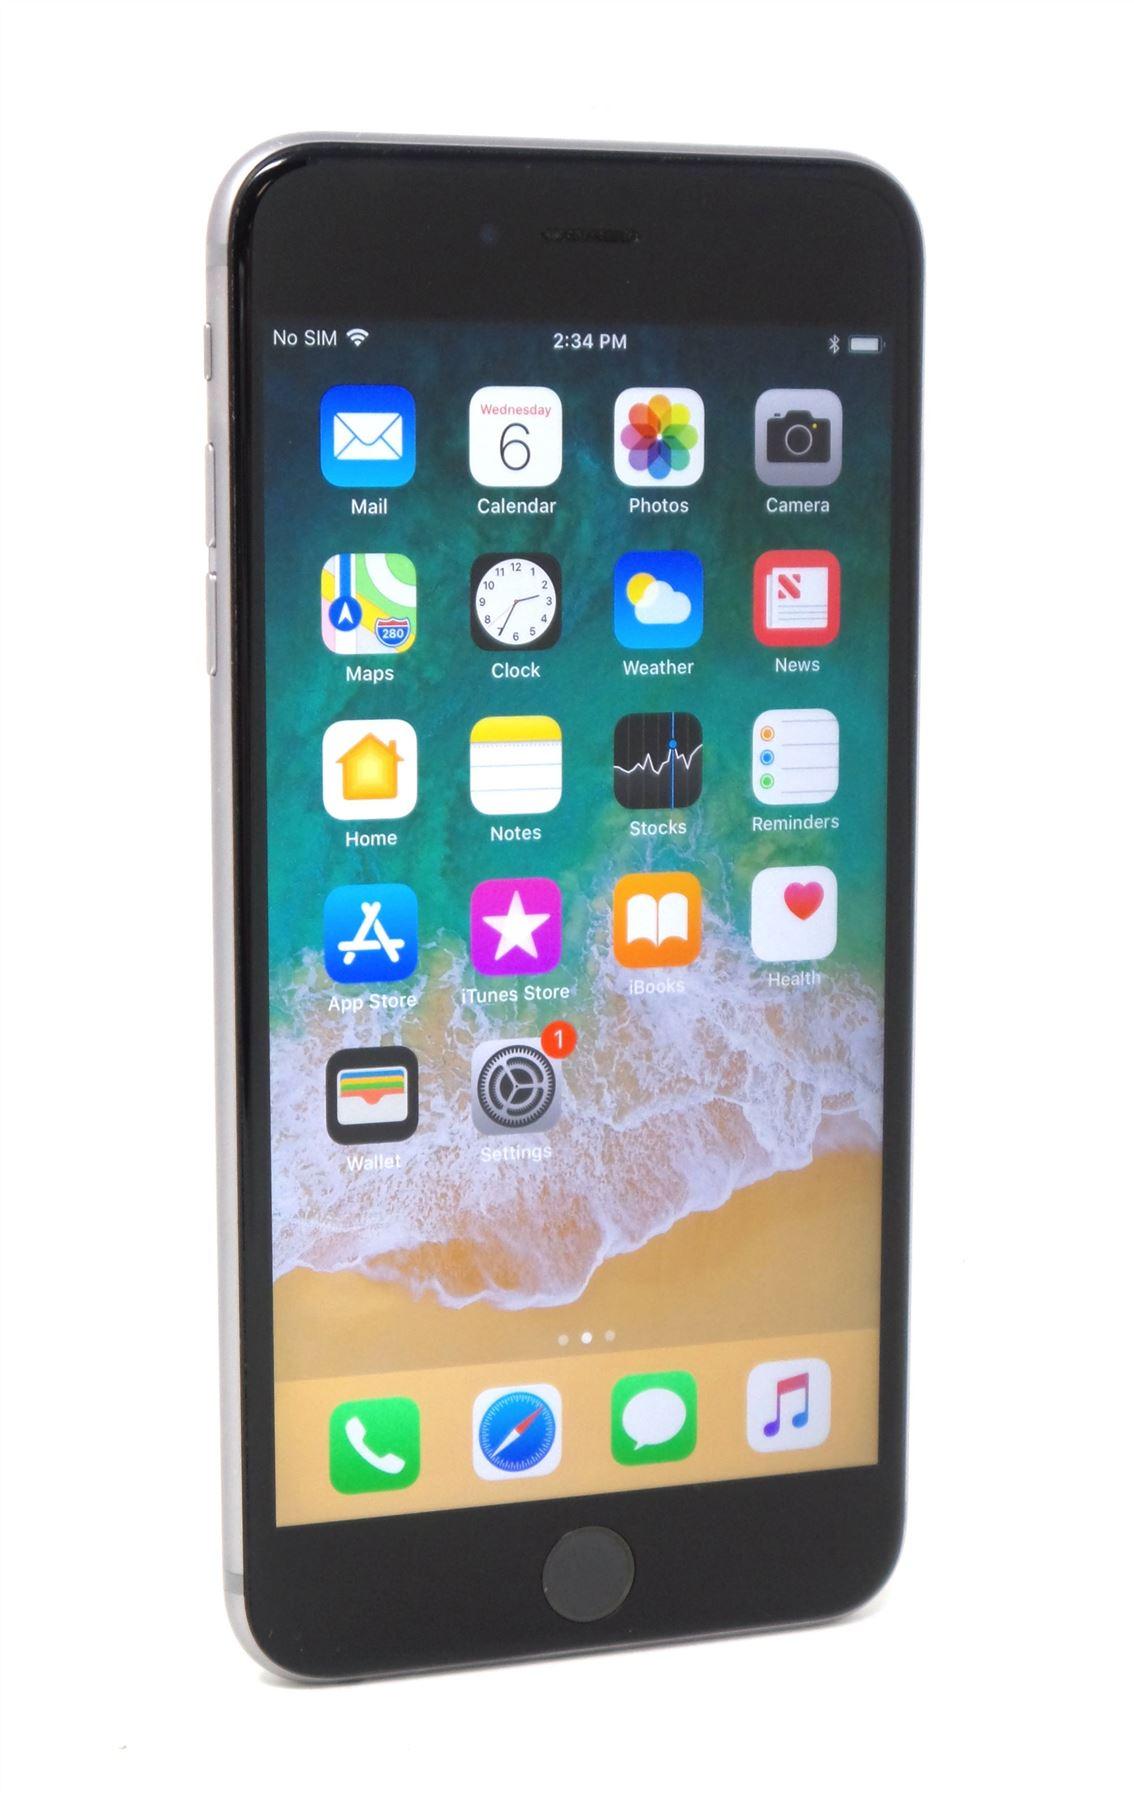 Apple-iPhone-6S-Plus-Carrier-Options-AT-amp-T-T-Mobile-Verizon-Unlocked-16-64-128GB thumbnail 23